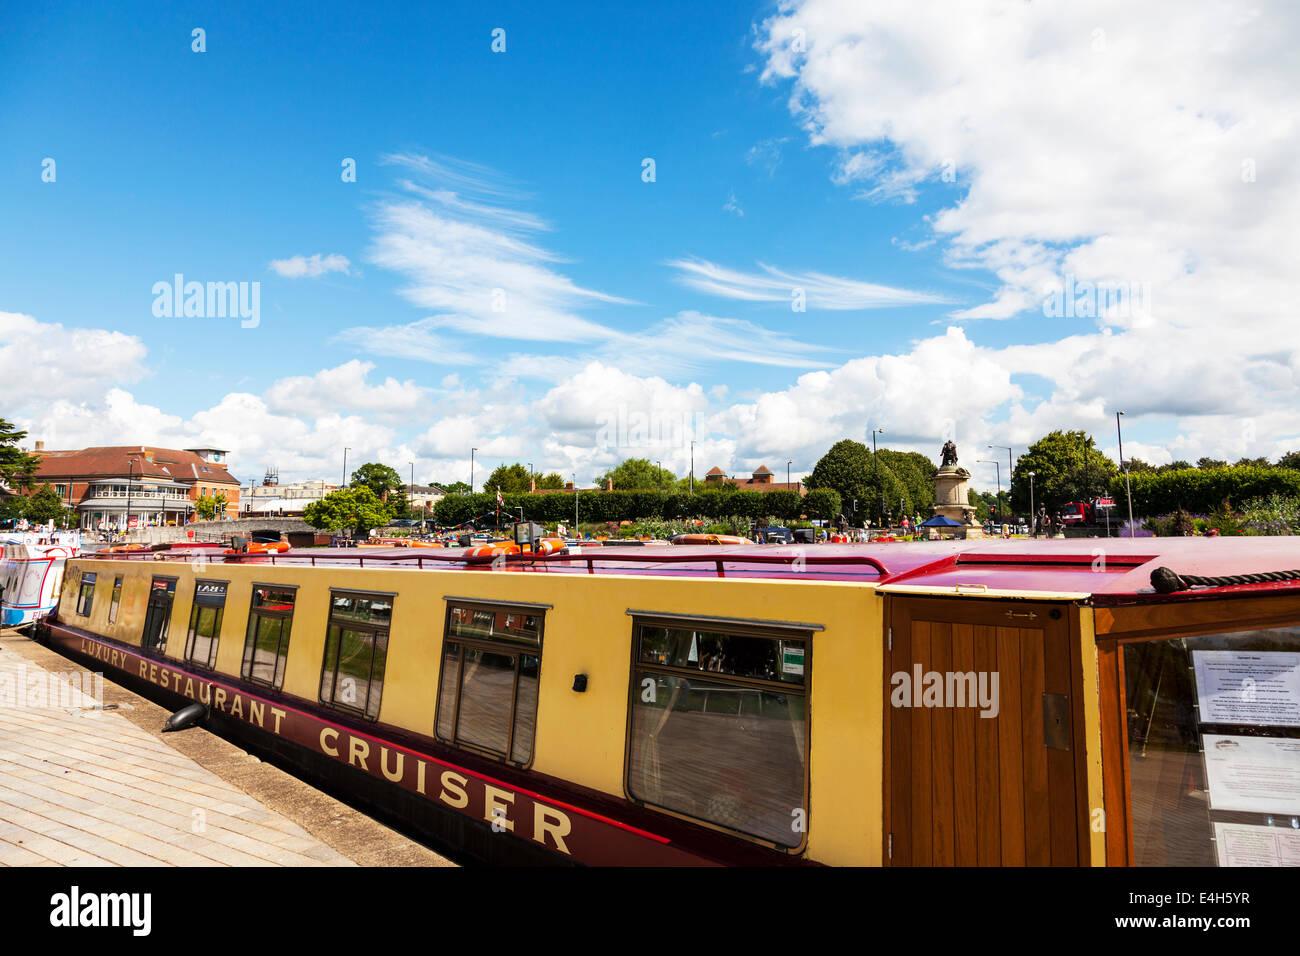 Stratford Upon Avon river barges narrow boats marina summer barge boat Cotswolds UK England - Stock Image